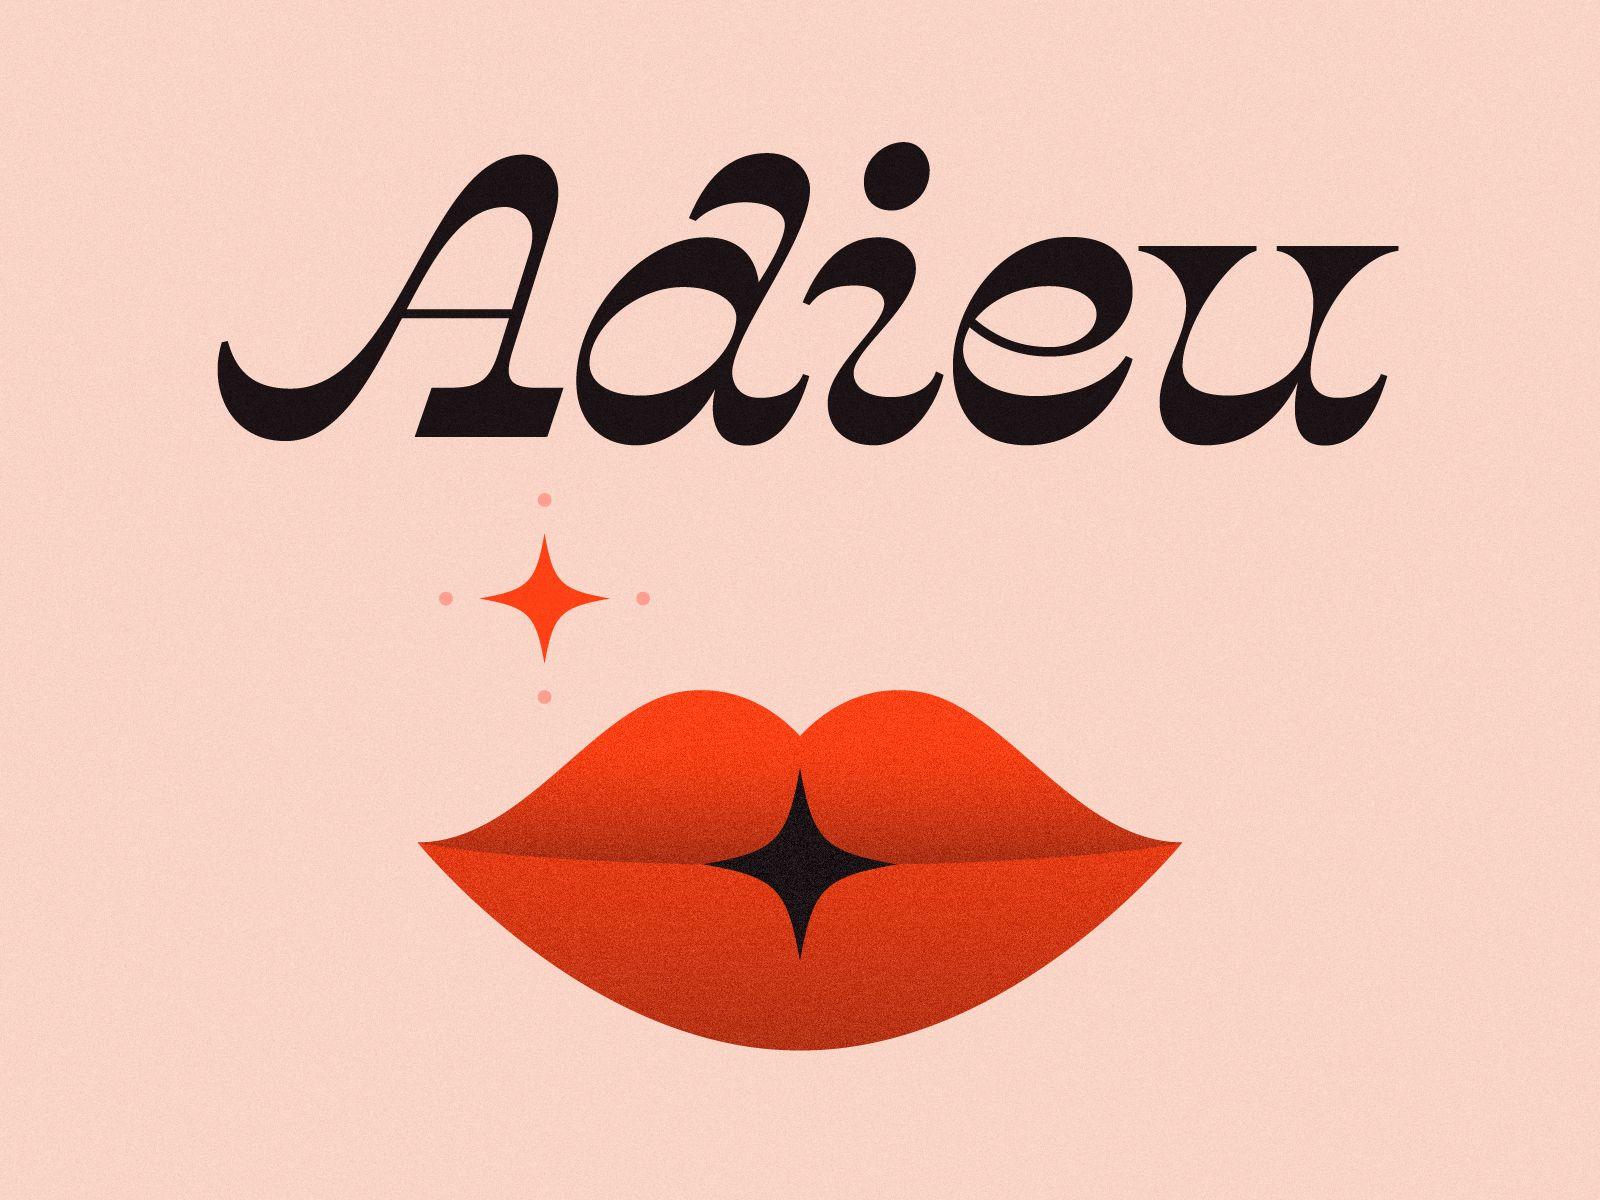 Adieu | typo | Typography design, Graphic design ...